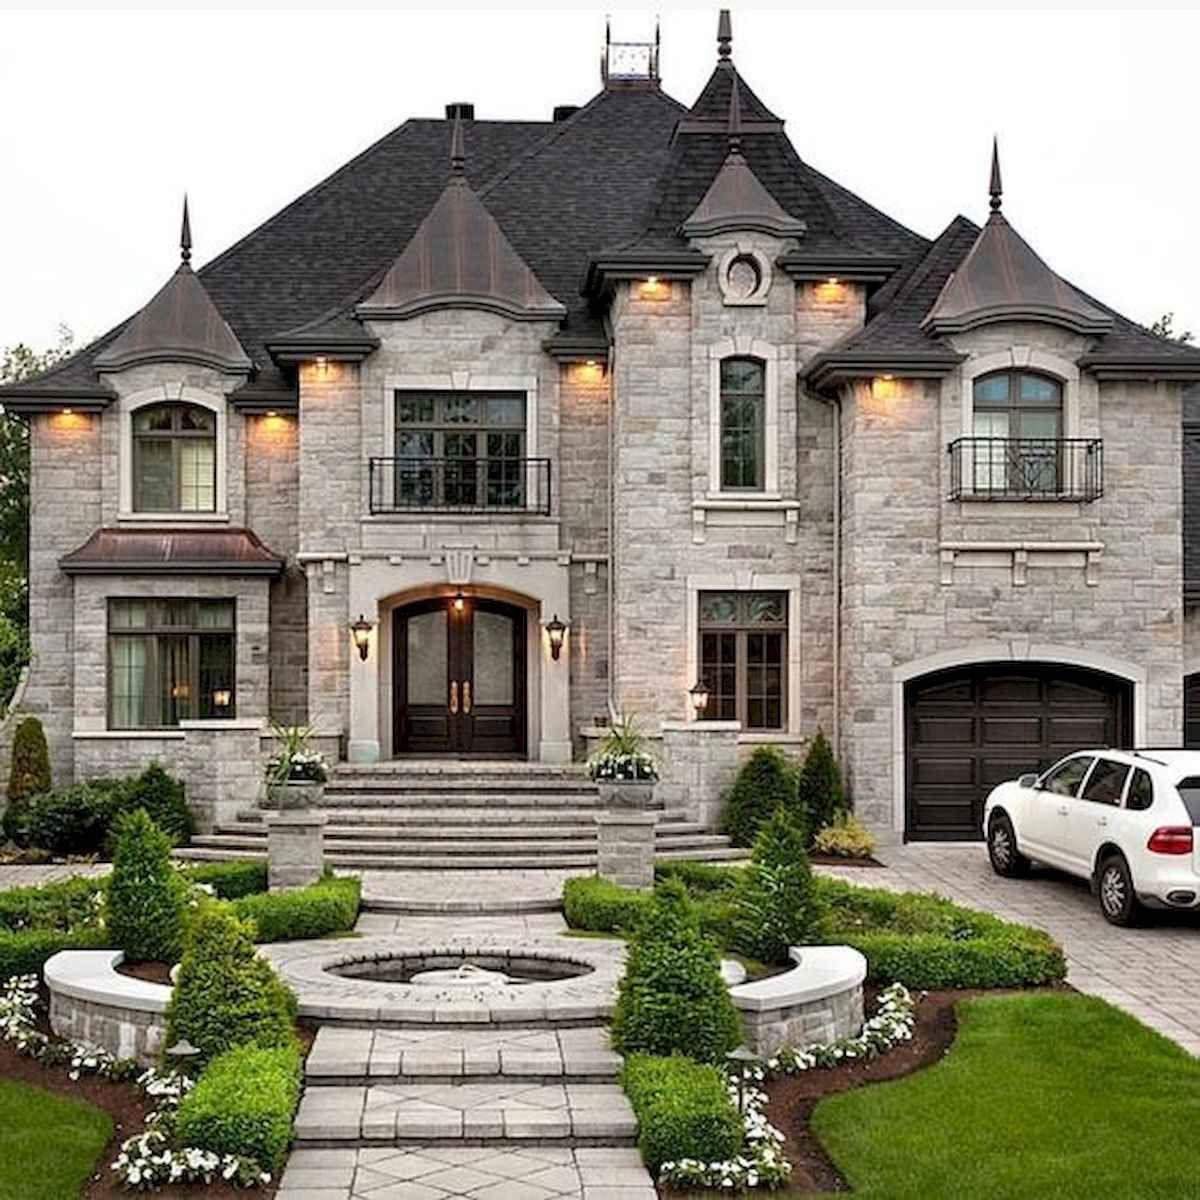 Modern Home Design Ideas Exterior: 40 Fantastic Dream Home Exterior Design Ideas (25)